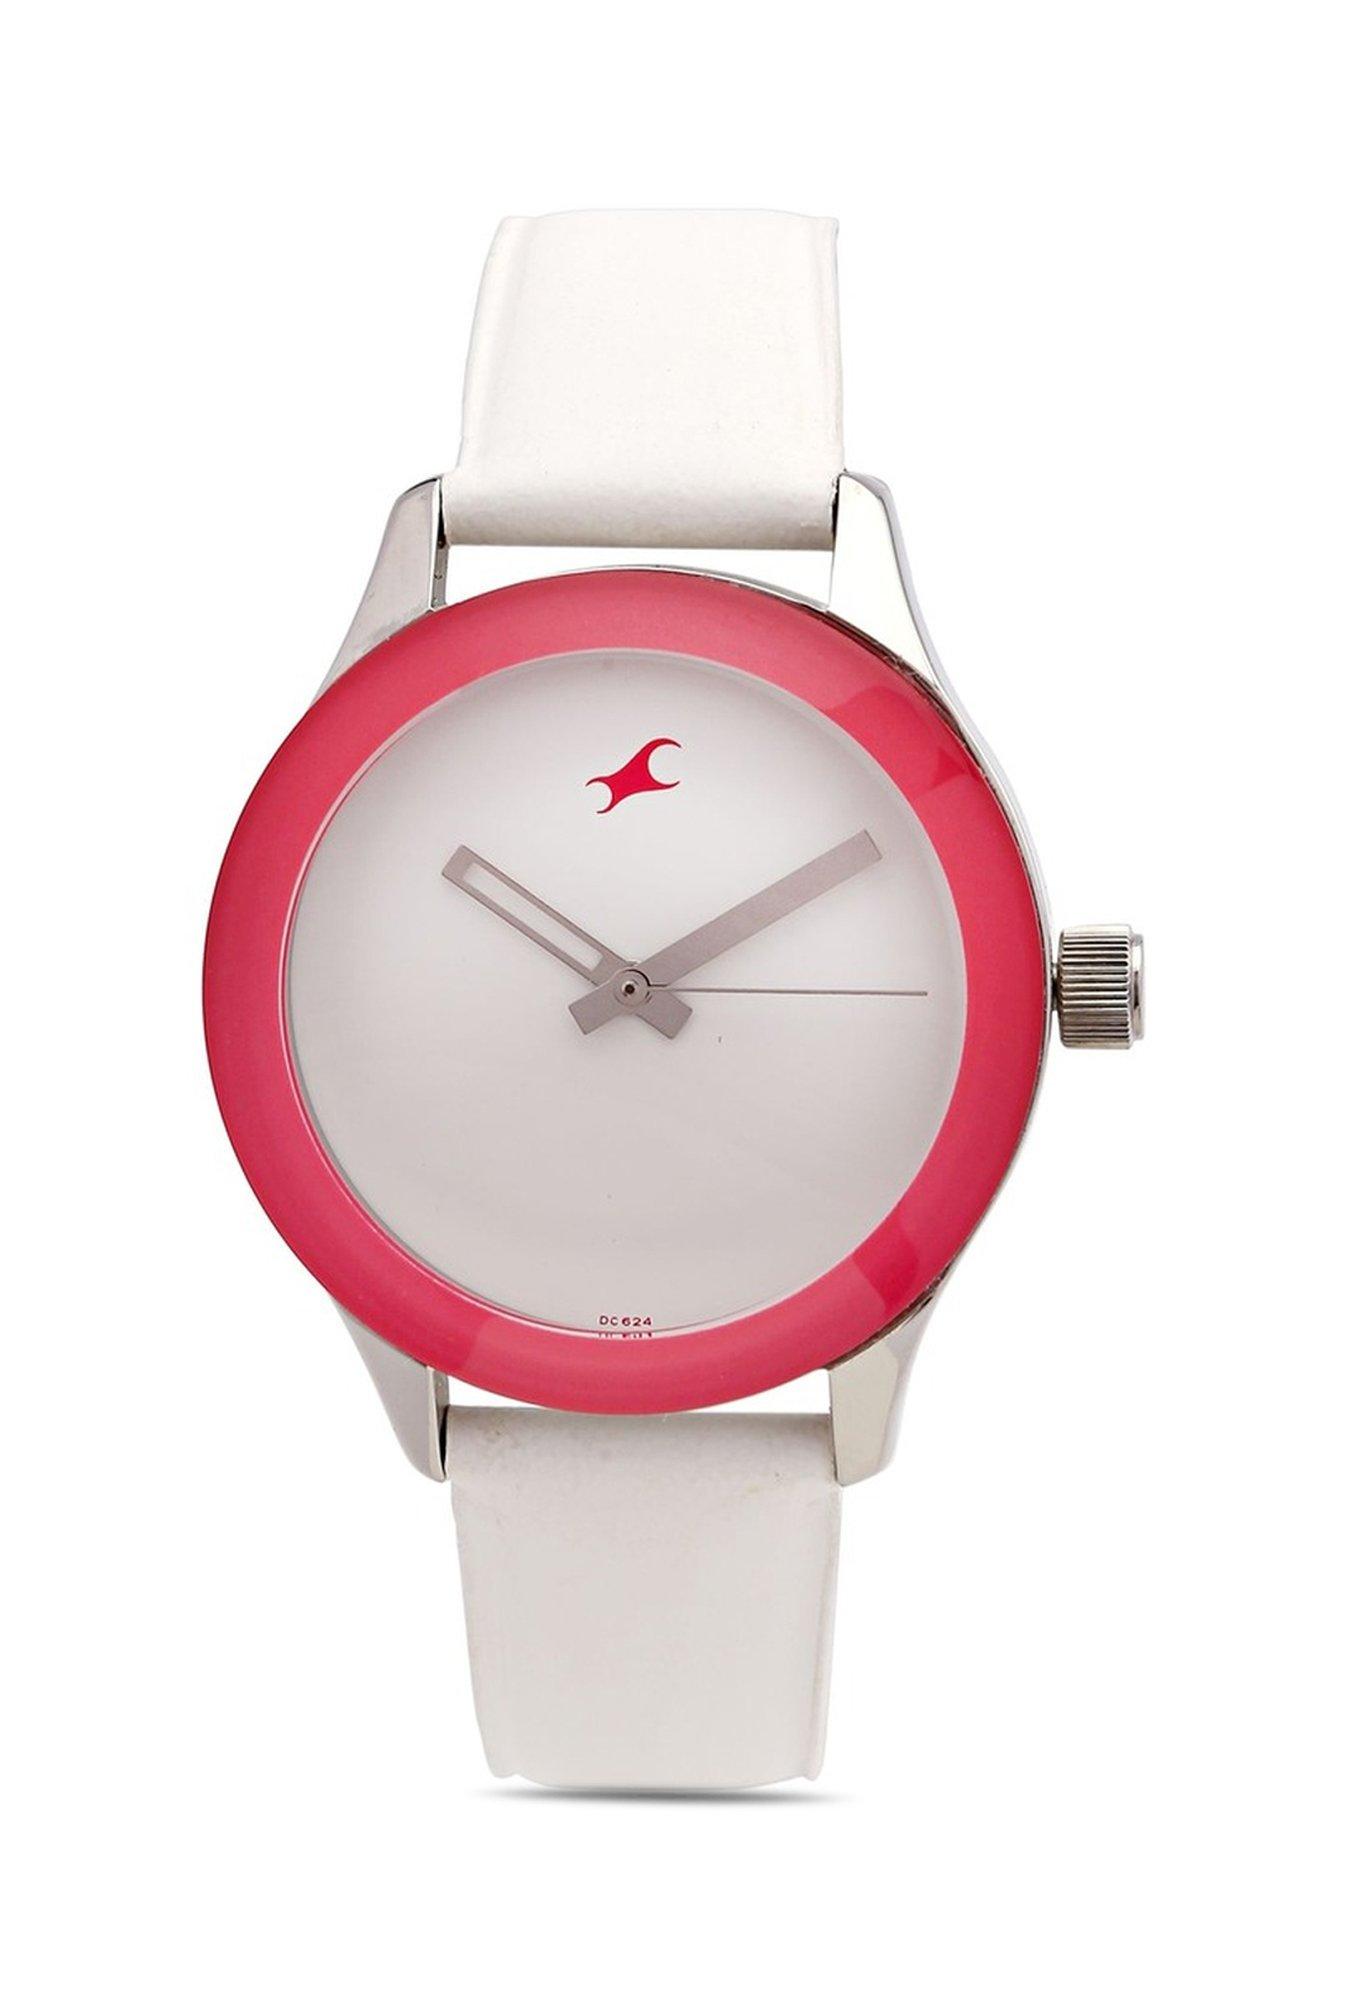 Fastrack 6078SL01 Monochrome Analog White Dial Women's Watch (6078SL01)